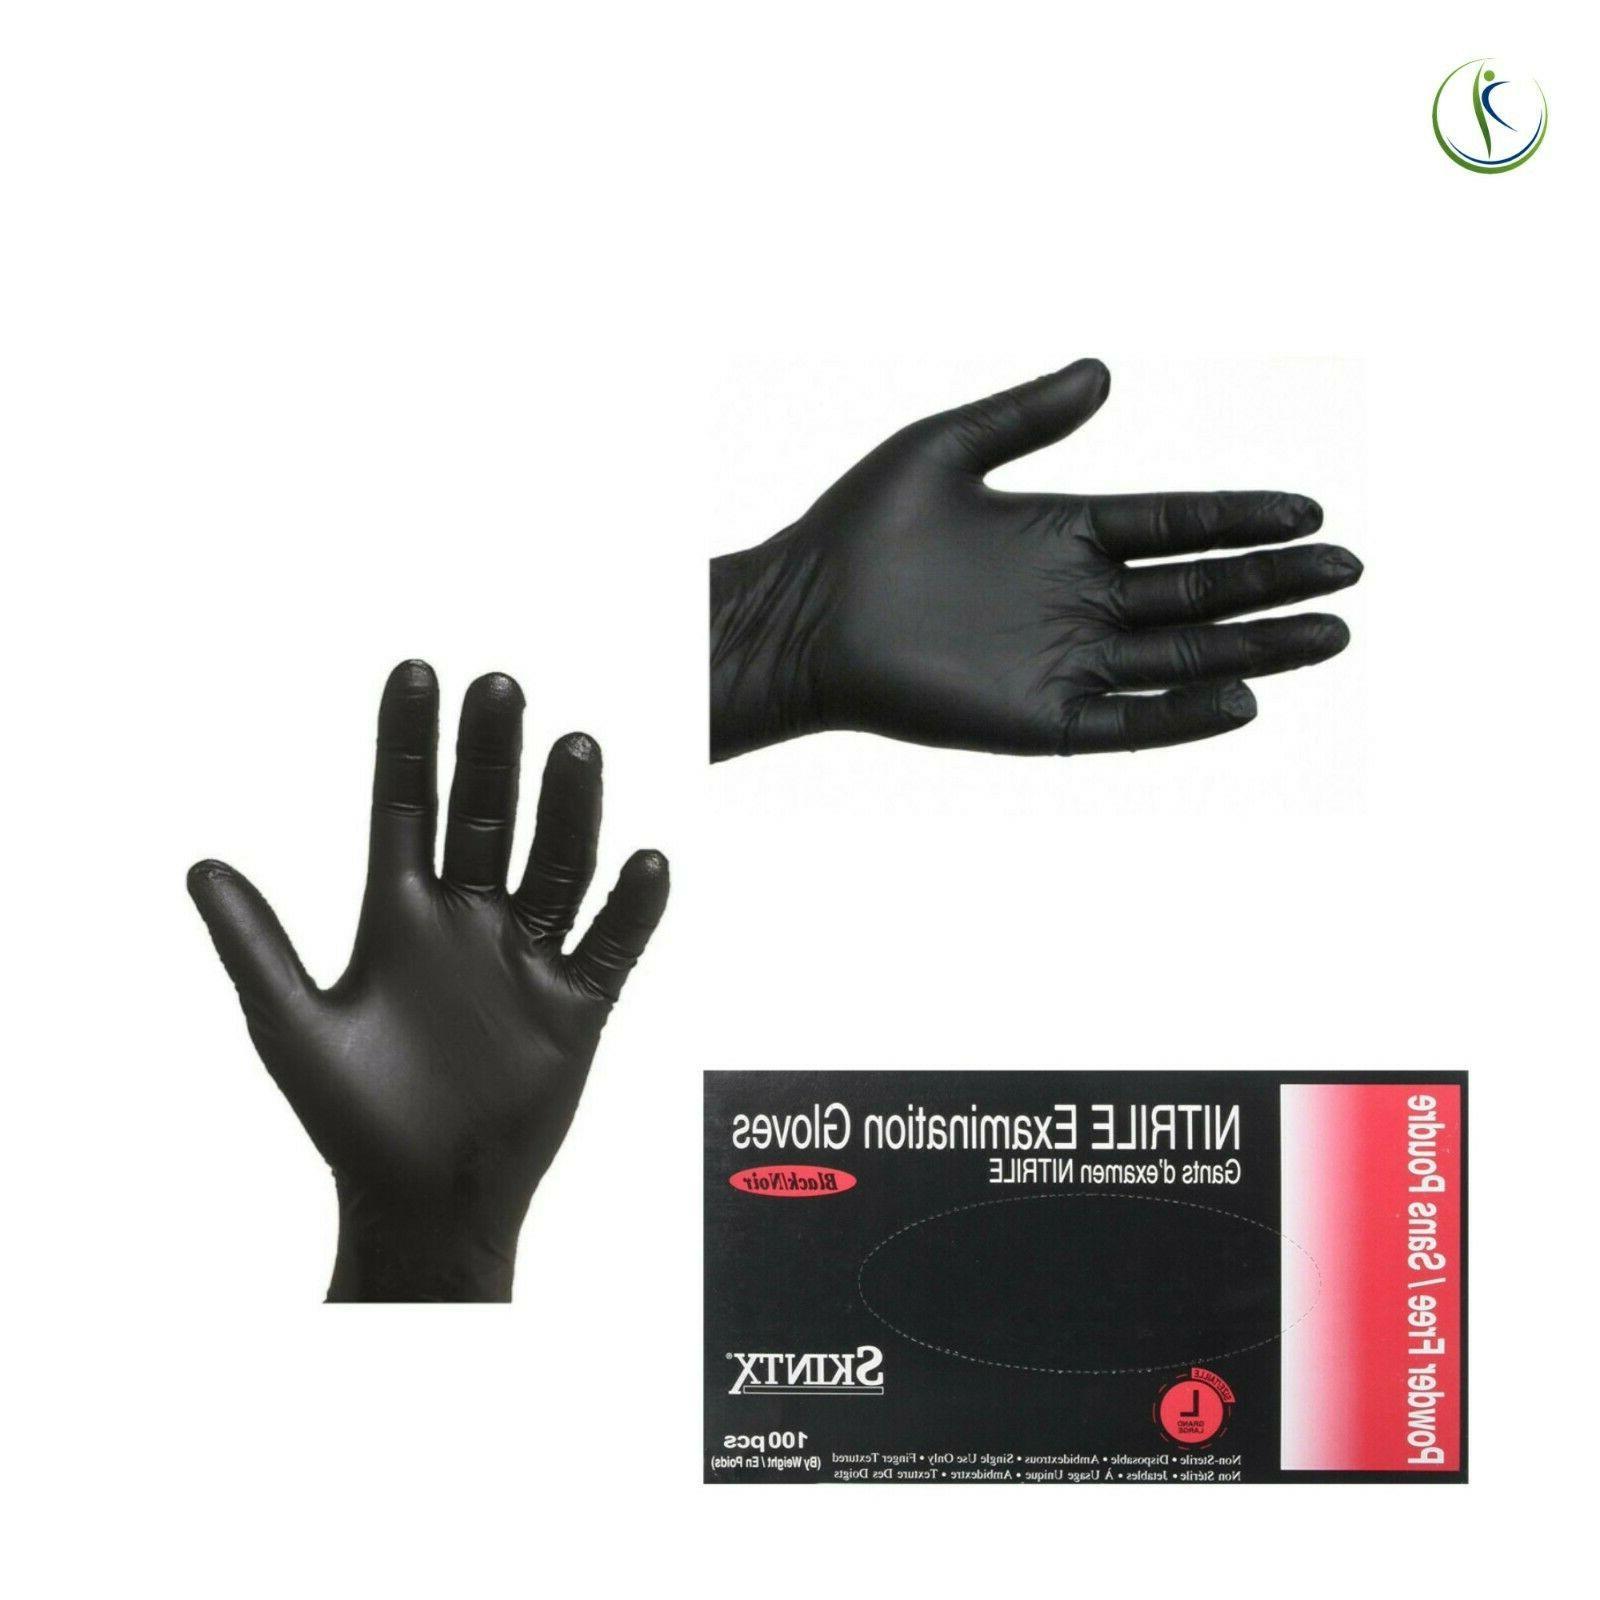 nitrile disposable examination gloves powder free dental